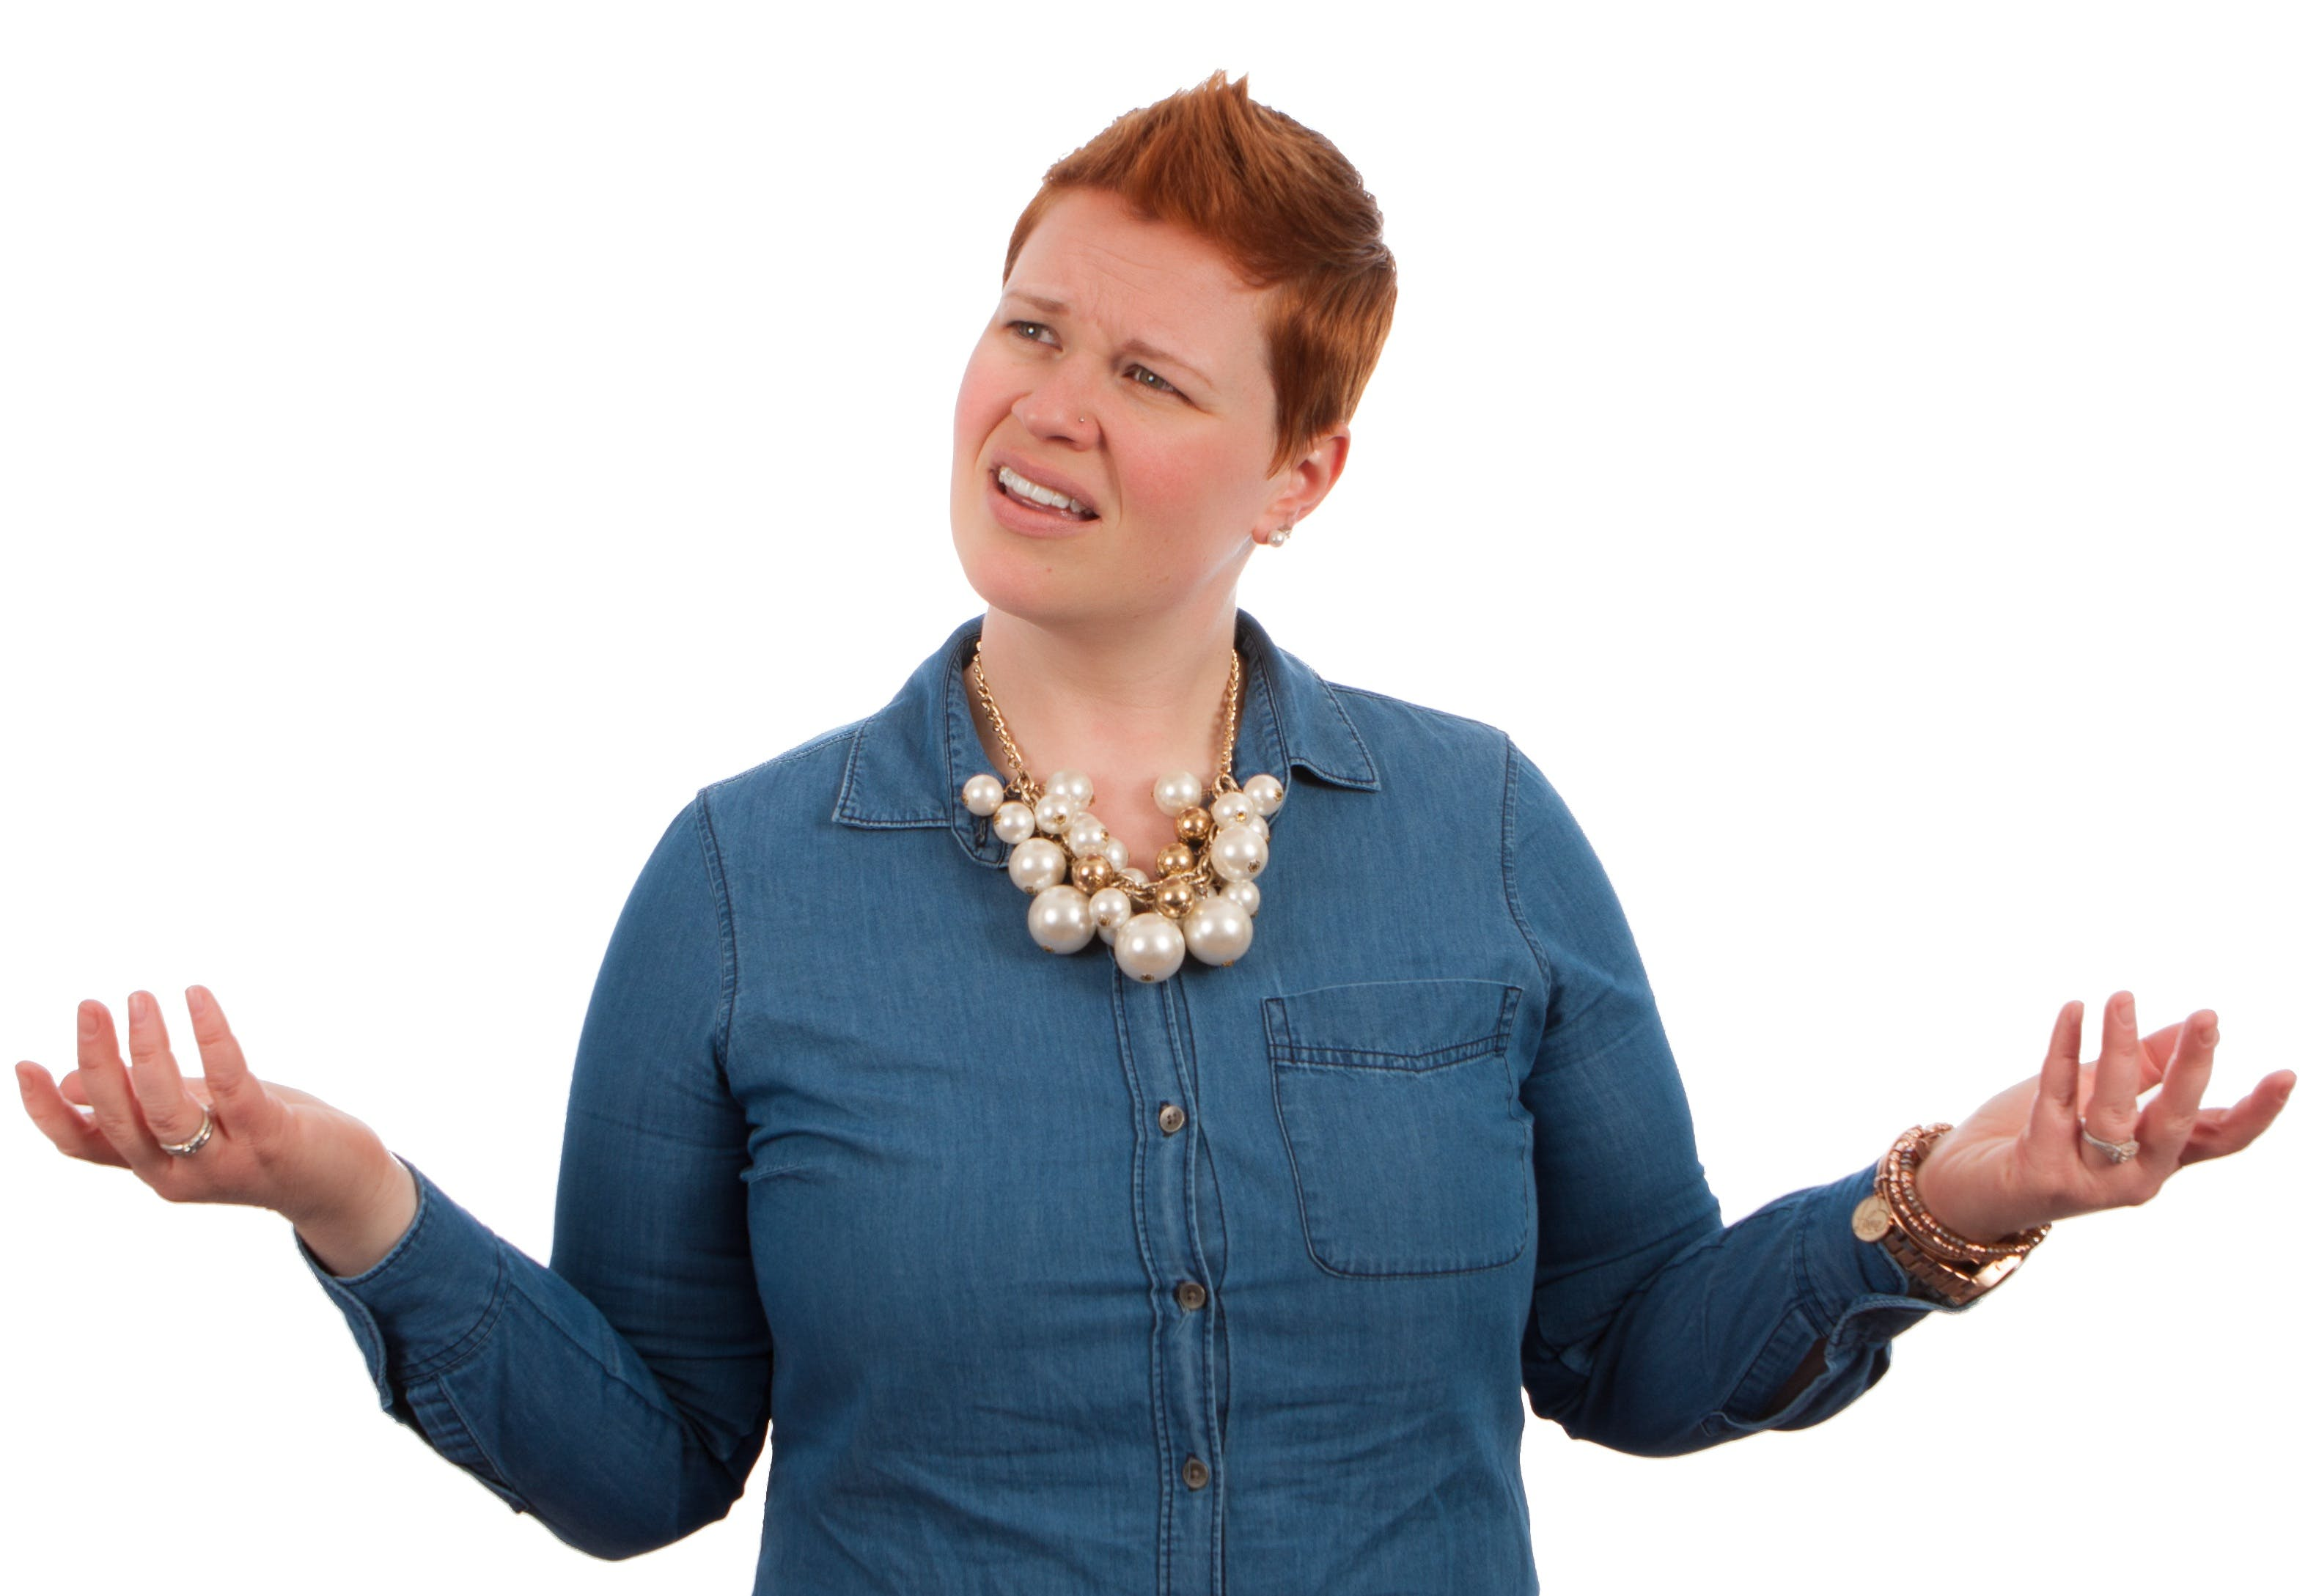 Woman Wearing Blue Button Up Long Sleeve Shirt